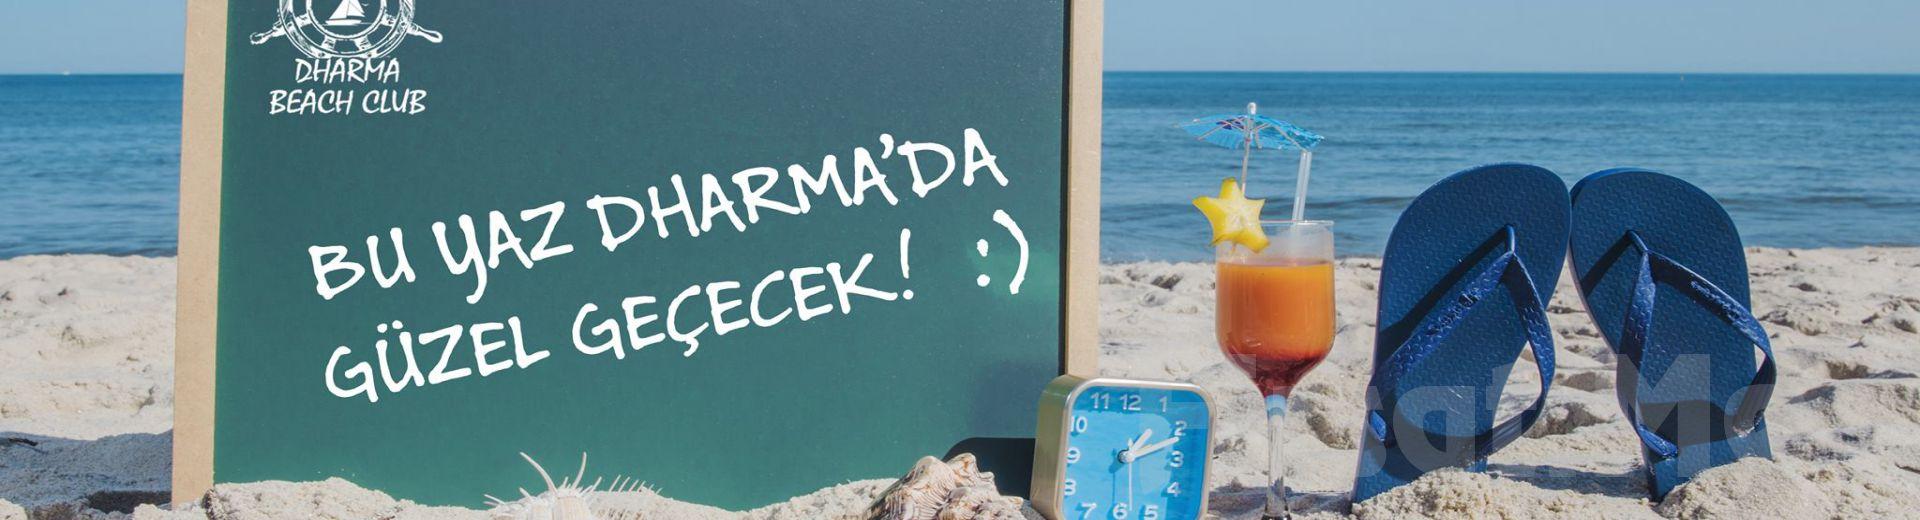 Çeşme Dharma Beach Club'ta Tüm Gün Plaj Girişi, Şezlong, Şemsiye, Pizza veya Hamburger Menü Seçenekleri